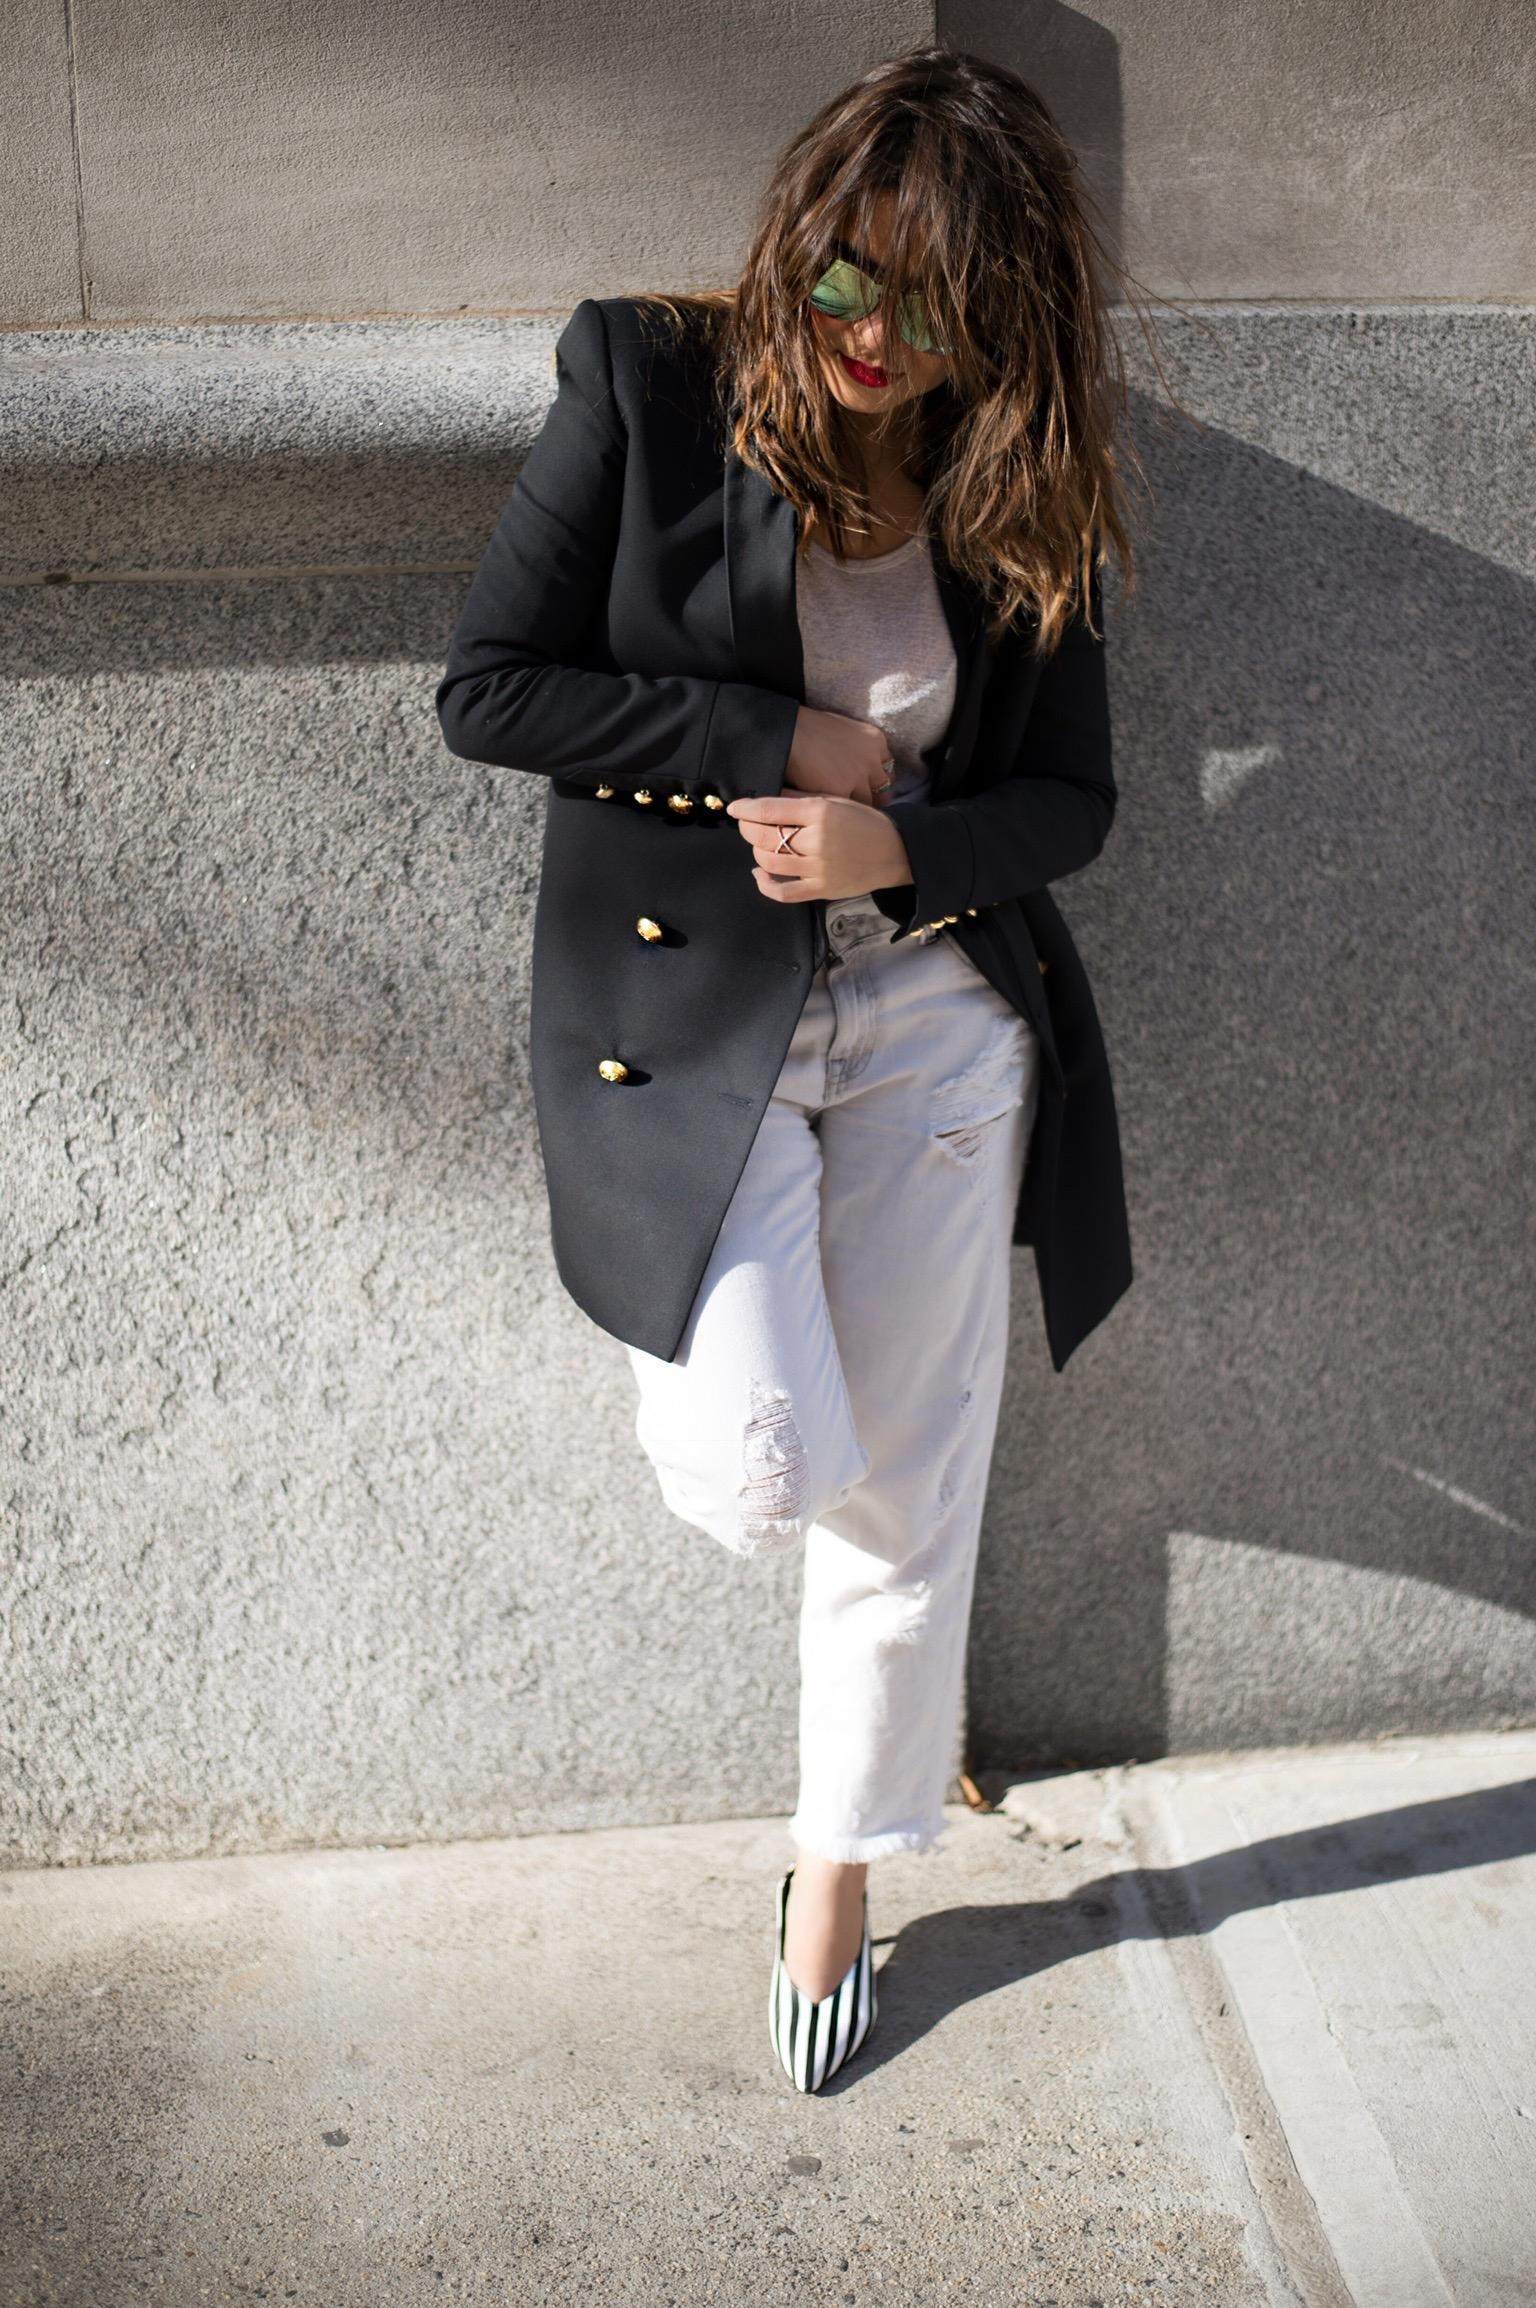 new-york-street-style-blazer-and-jean-looks